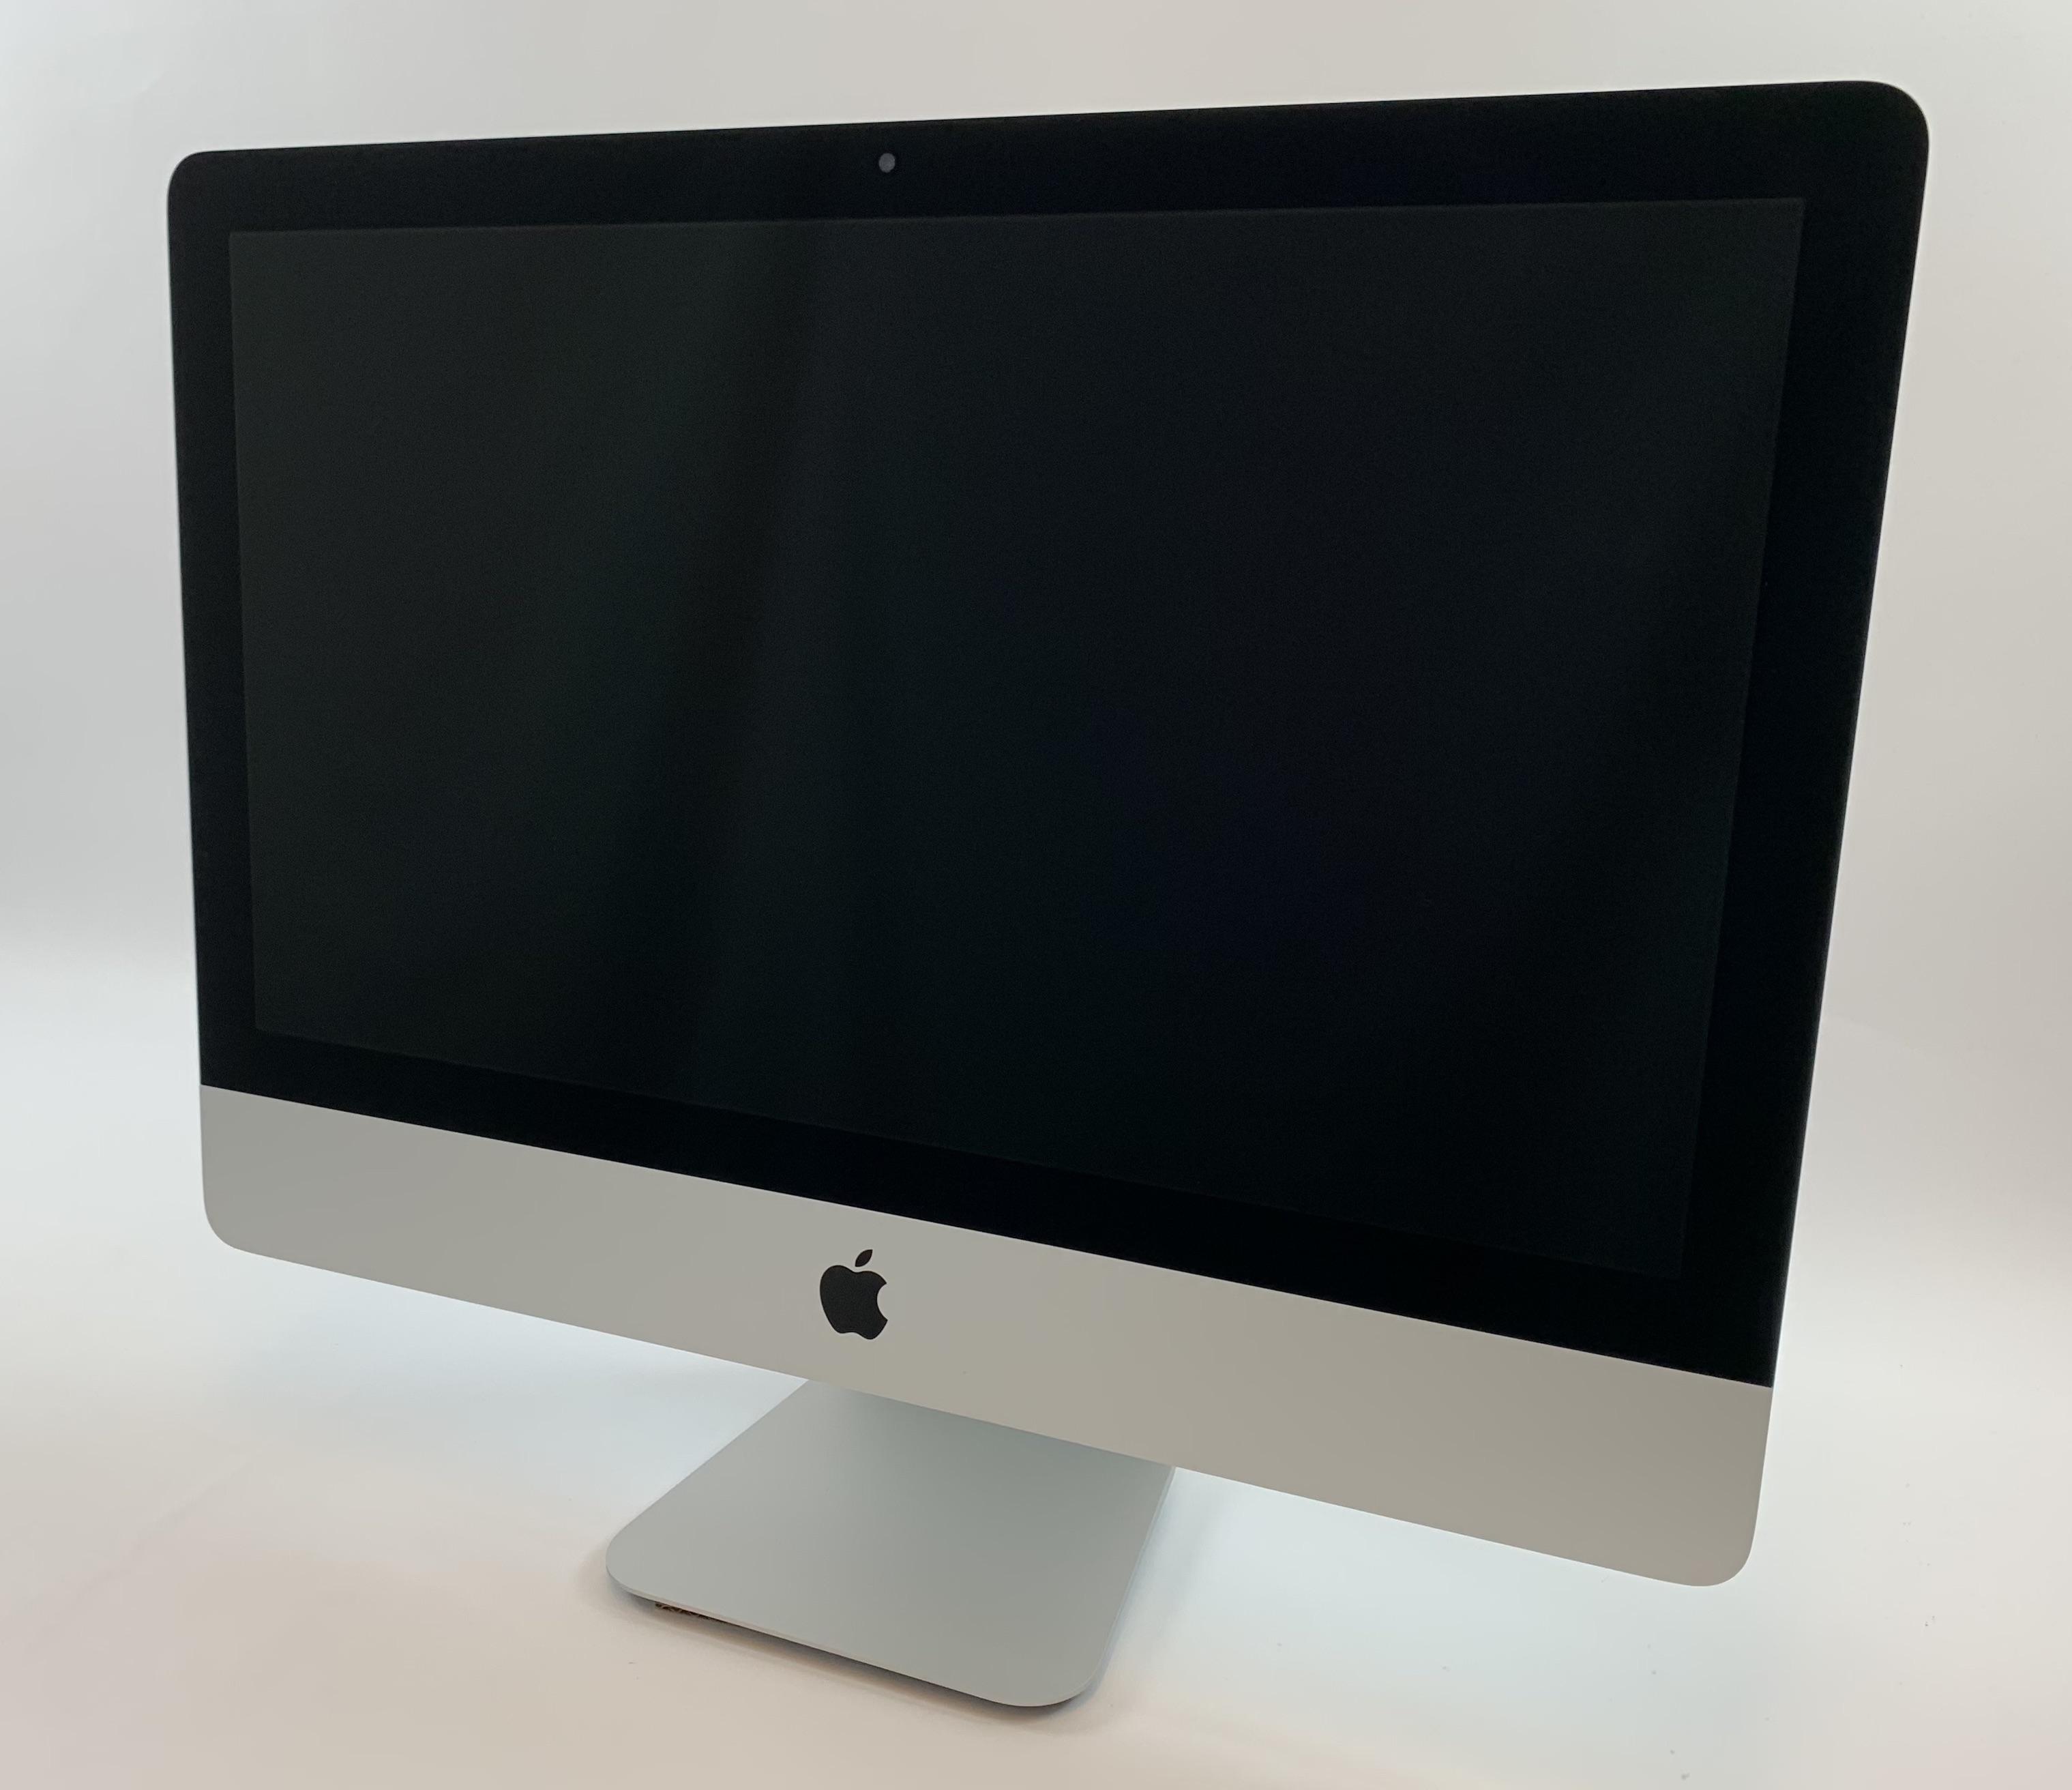 "iMac 21.5"" Retina 4K Early 2019 (Intel Quad-Core i3 3.6 GHz 16 GB RAM 256 GB SSD), Intel Quad-Core i3 3.6 GHz, 8 GB RAM, 1 TB SSD, bild 1"